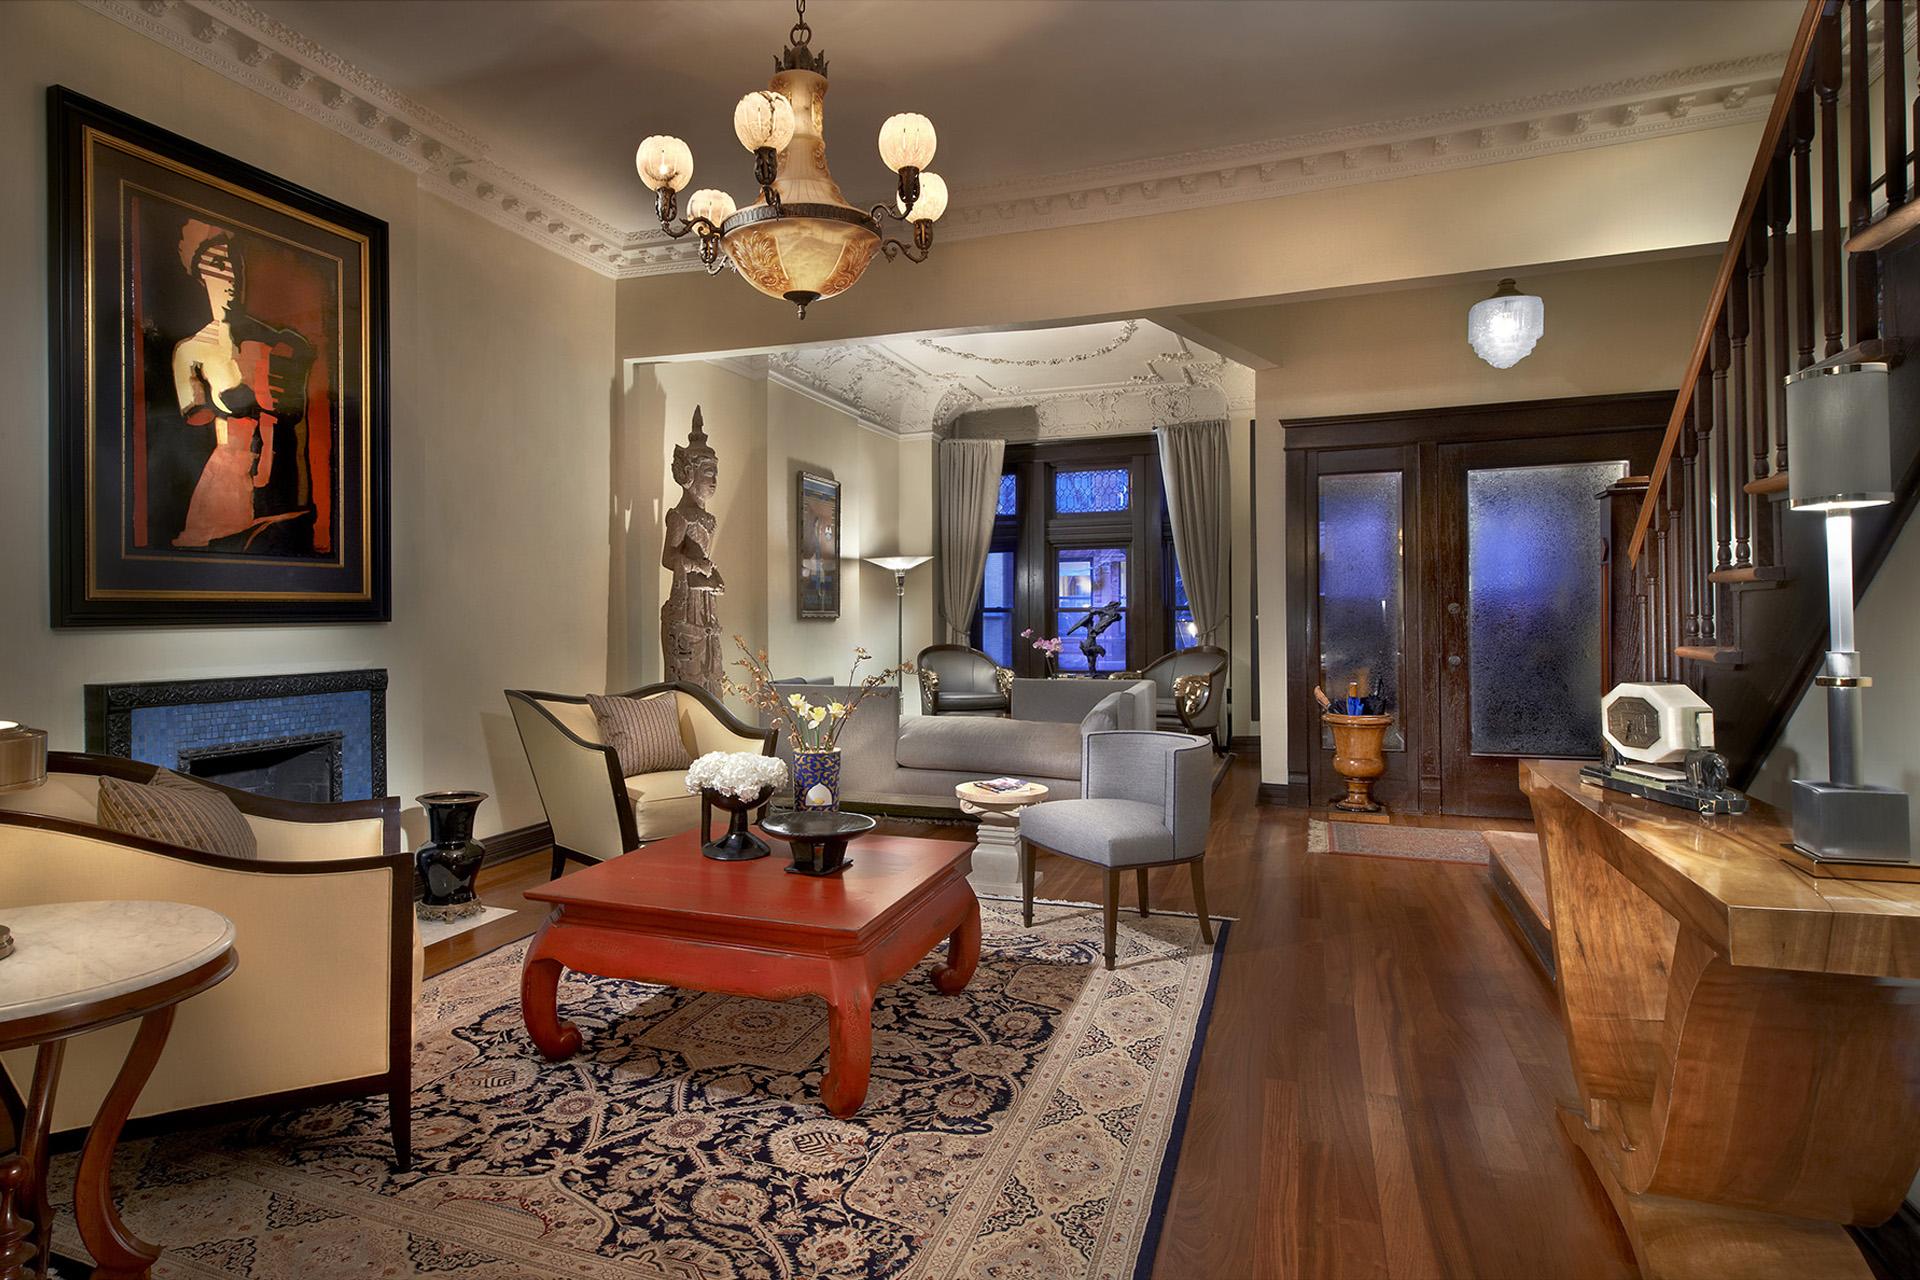 Best Kitchen Gallery: Chicago Roslyn Home Design Remodeling Gallery of Home Design Remodeling  on rachelxblog.com